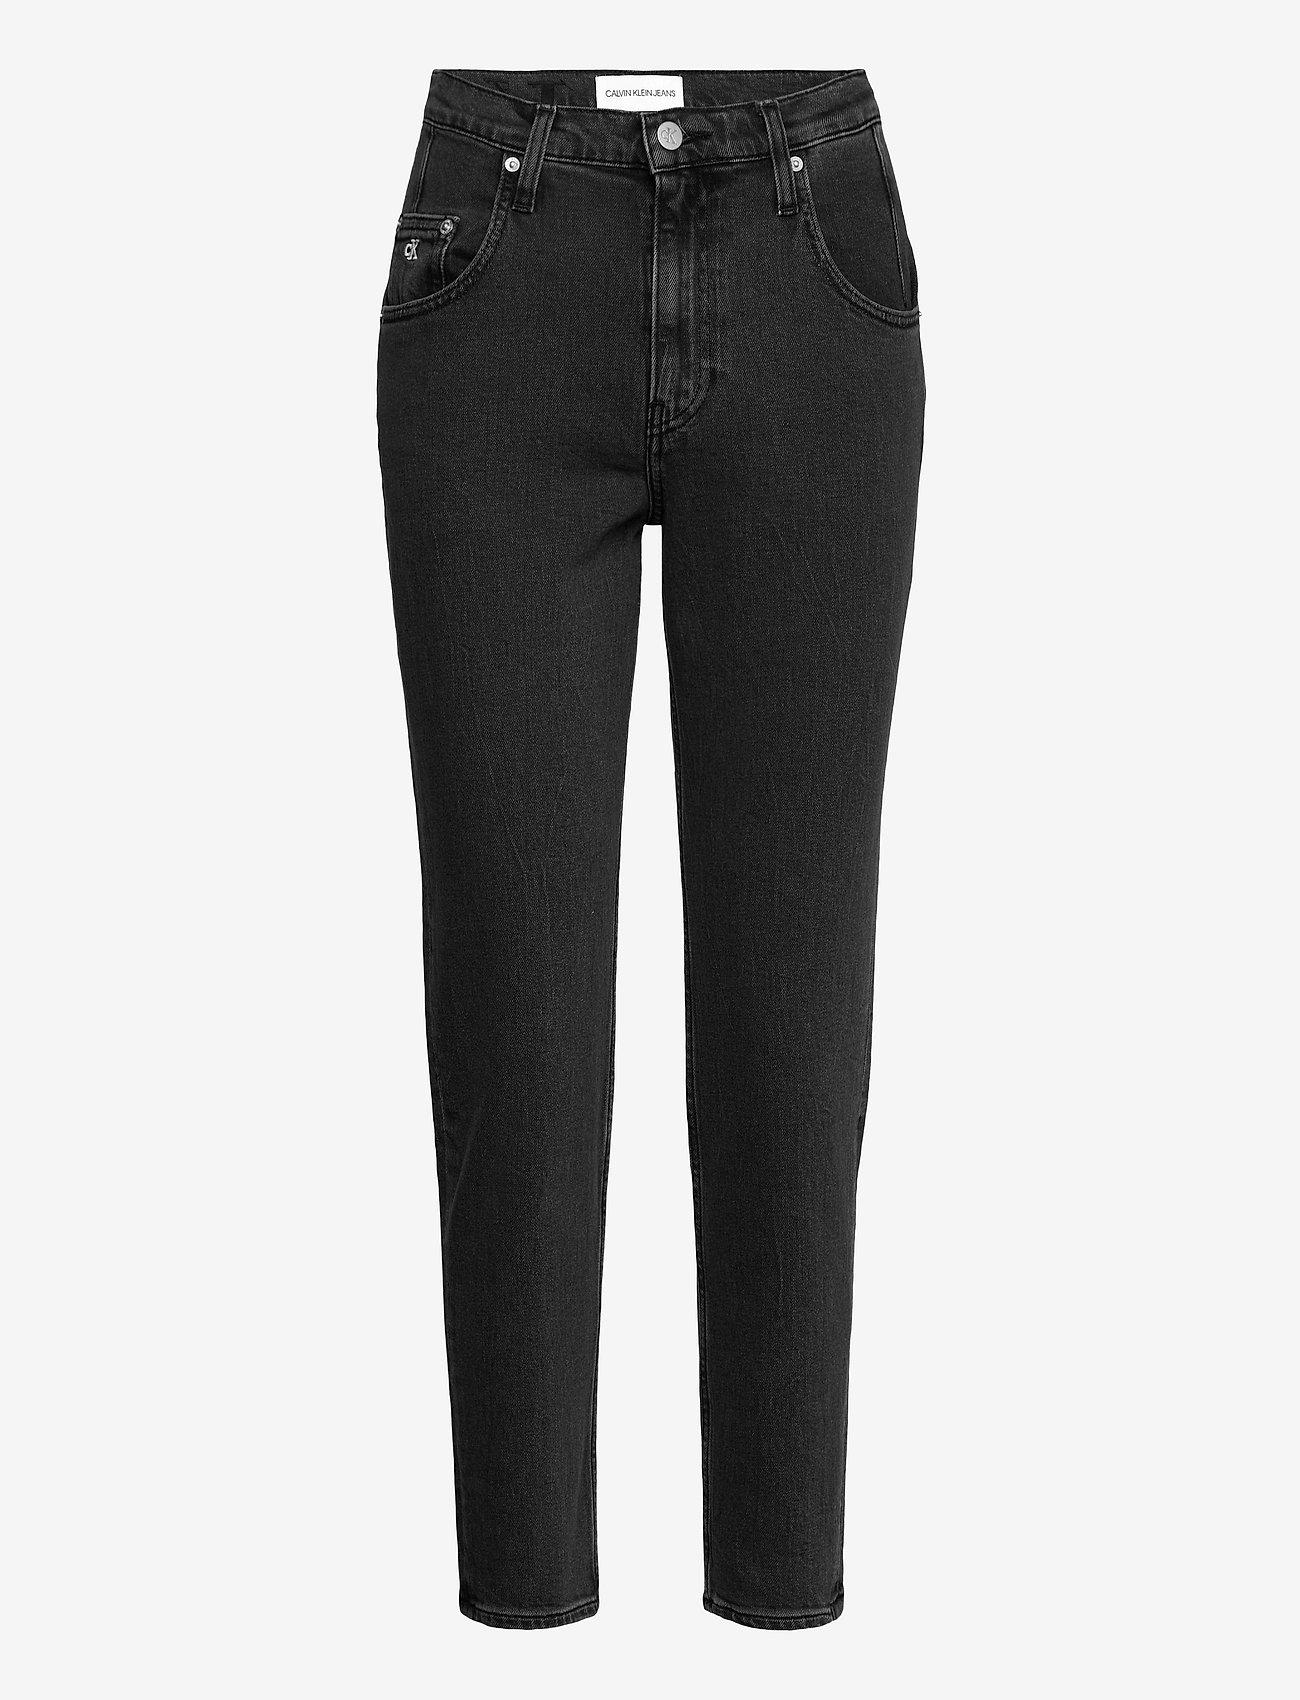 Calvin Klein Jeans - MOM JEAN - mammajeans - denim black - 0